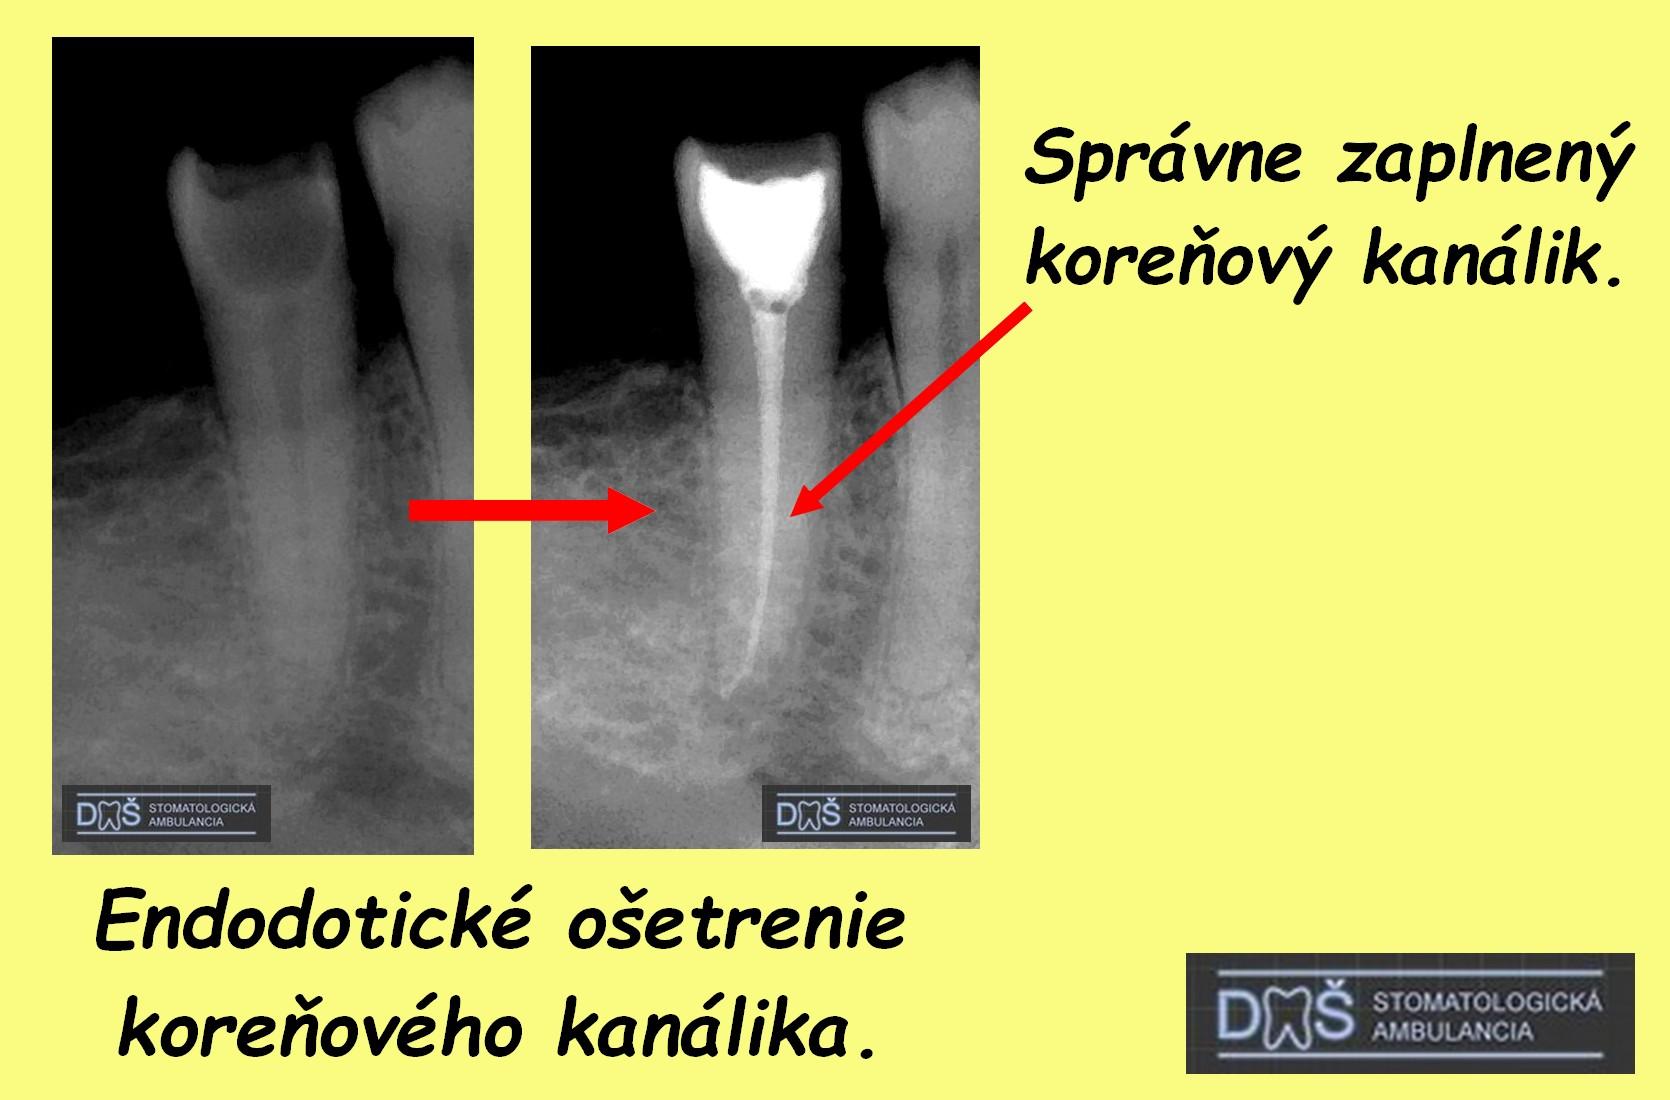 rtg endodoncia